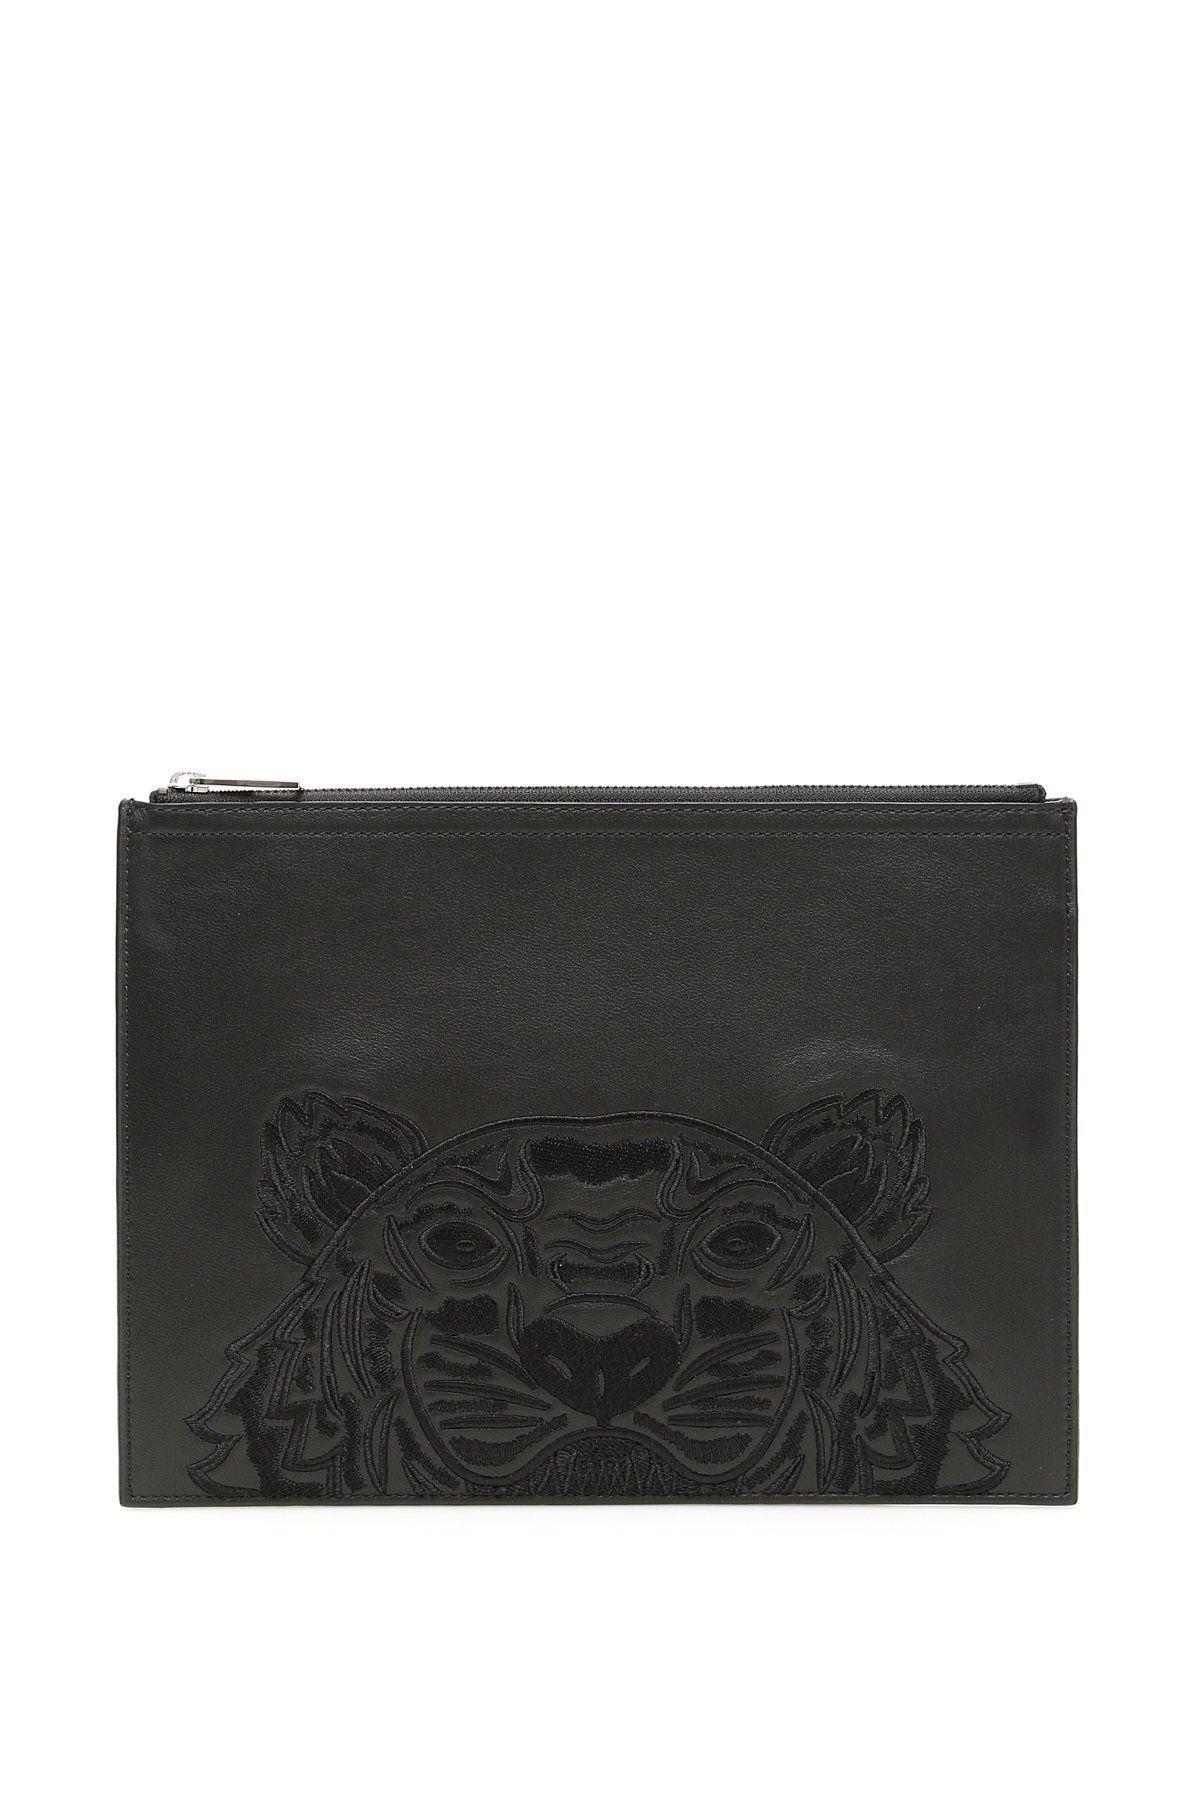 92726c5aef KENZO KENZO TIGER CLUTCH BAG. #kenzo #bags #leather #clutch #cotton ...